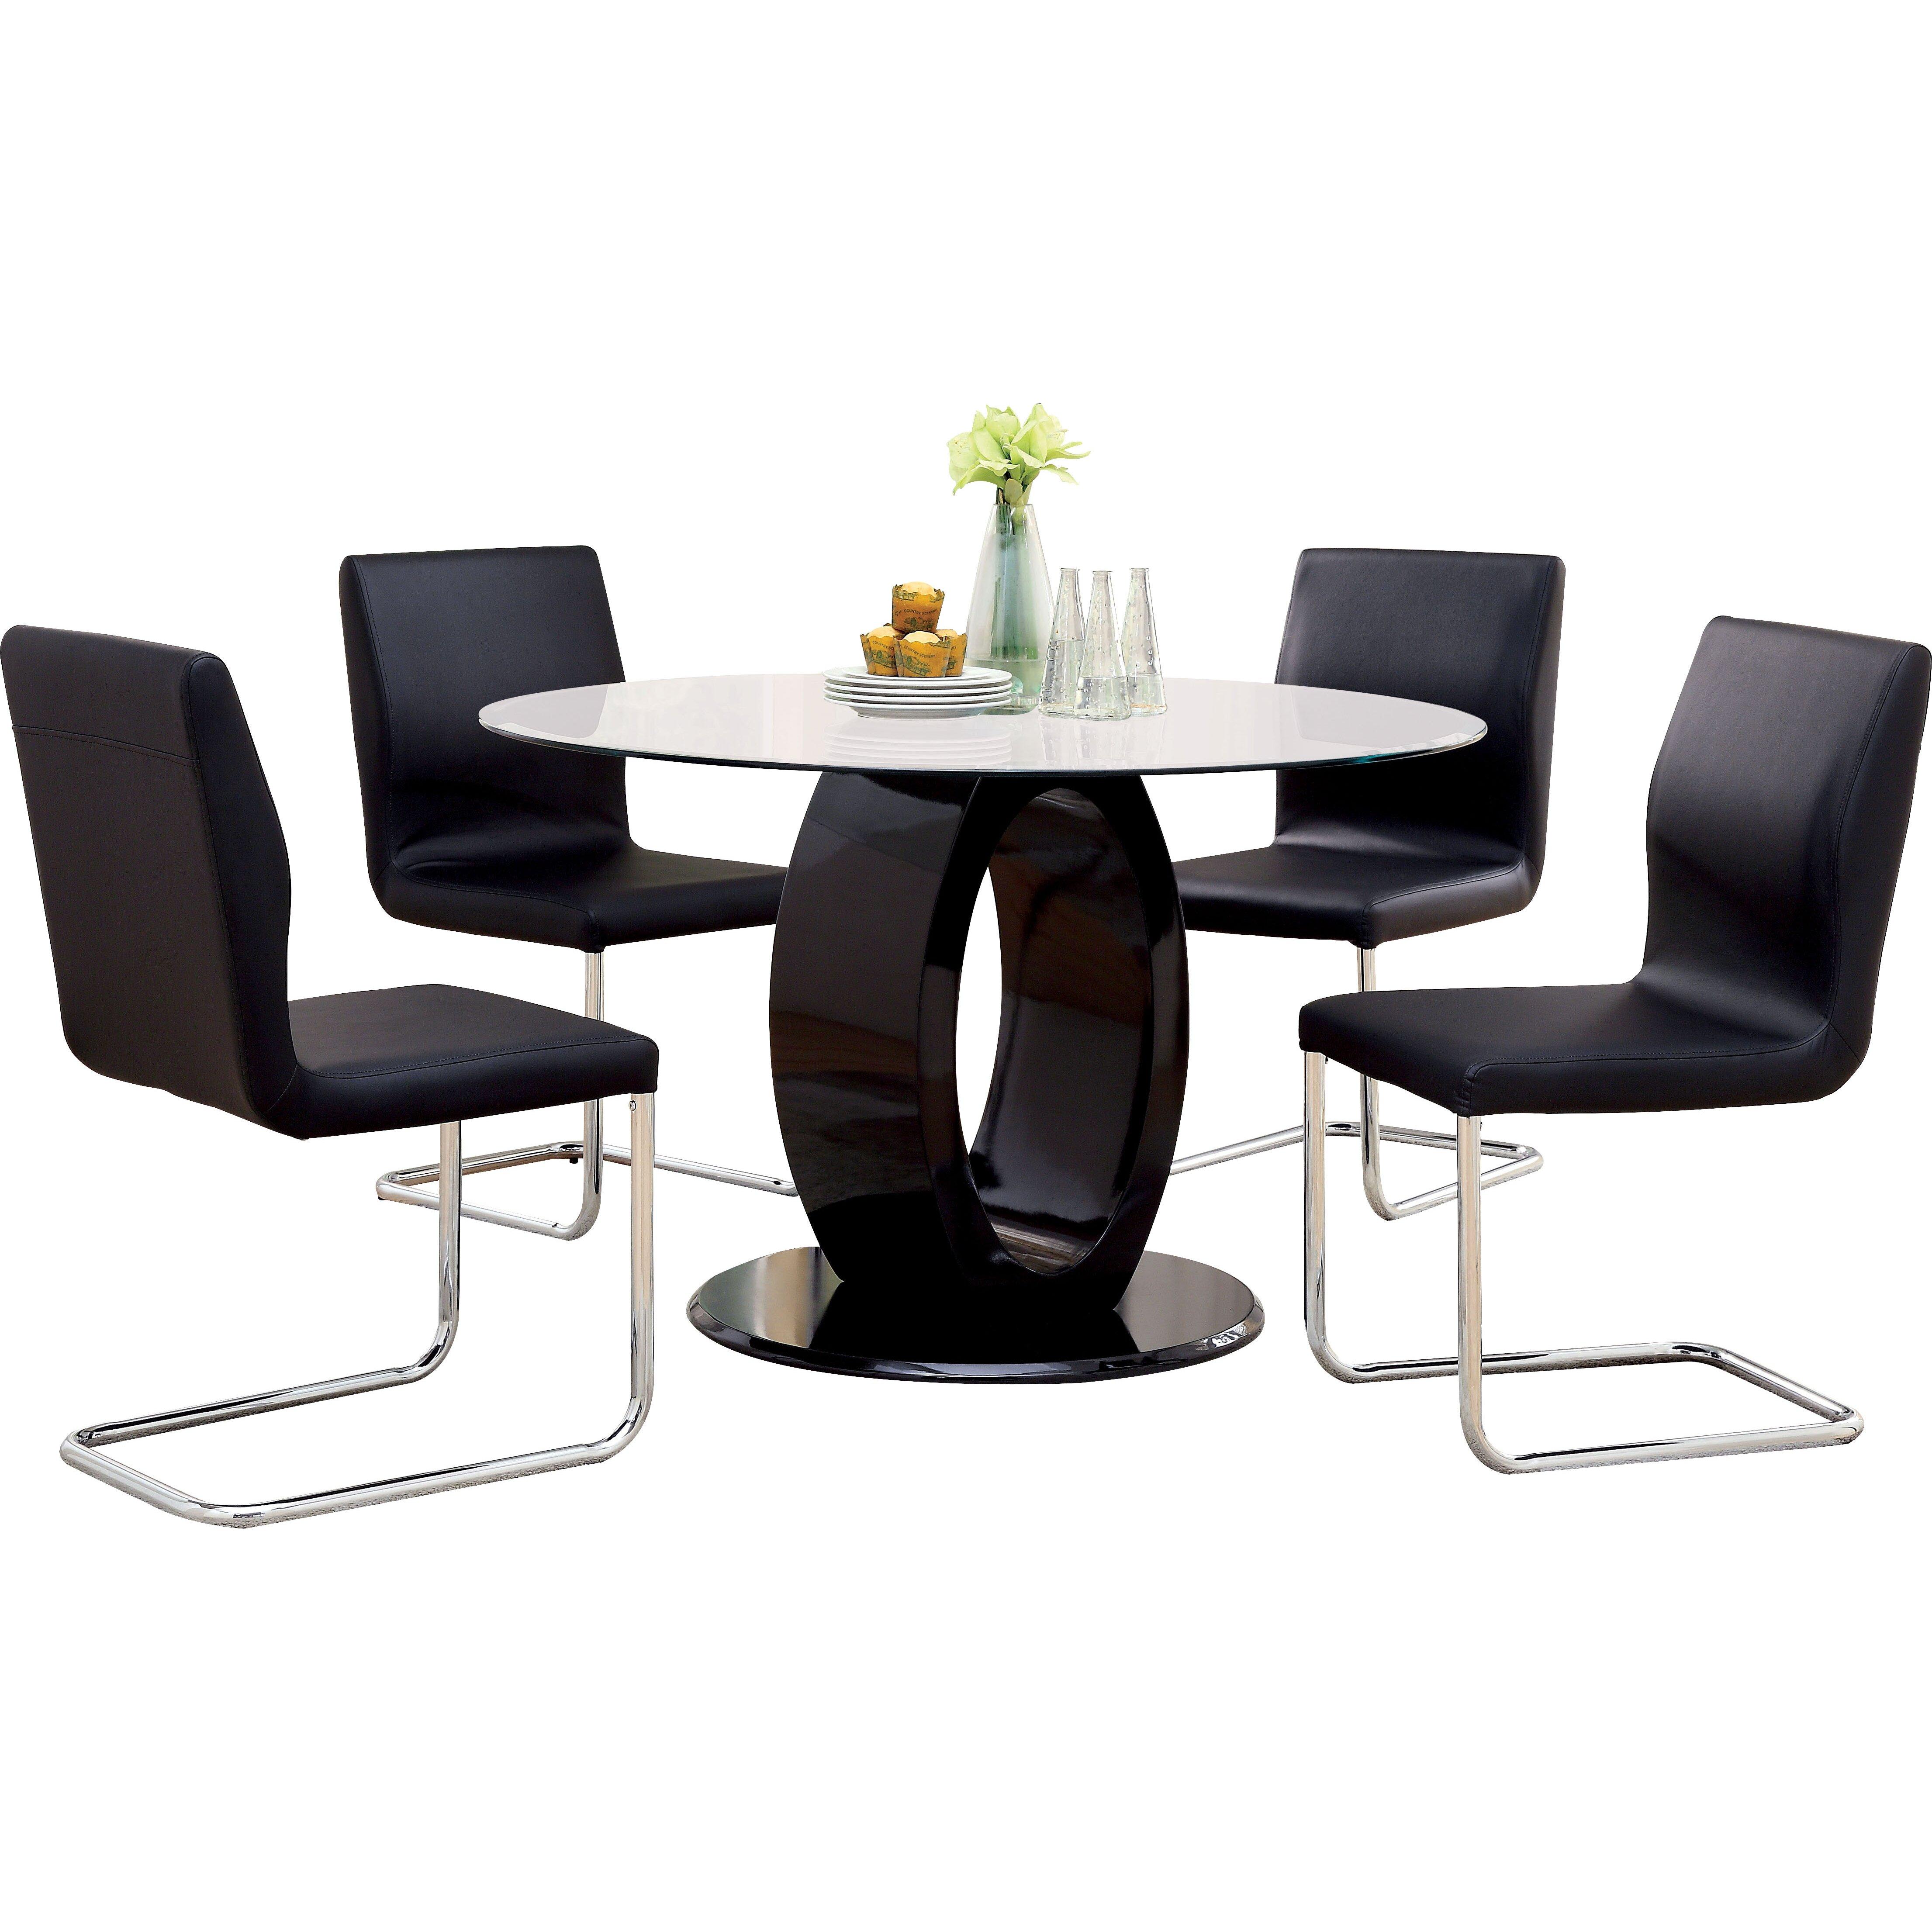 Hokku designs benedict 5 piece dining set reviews wayfair for Hokku designs dining room furniture